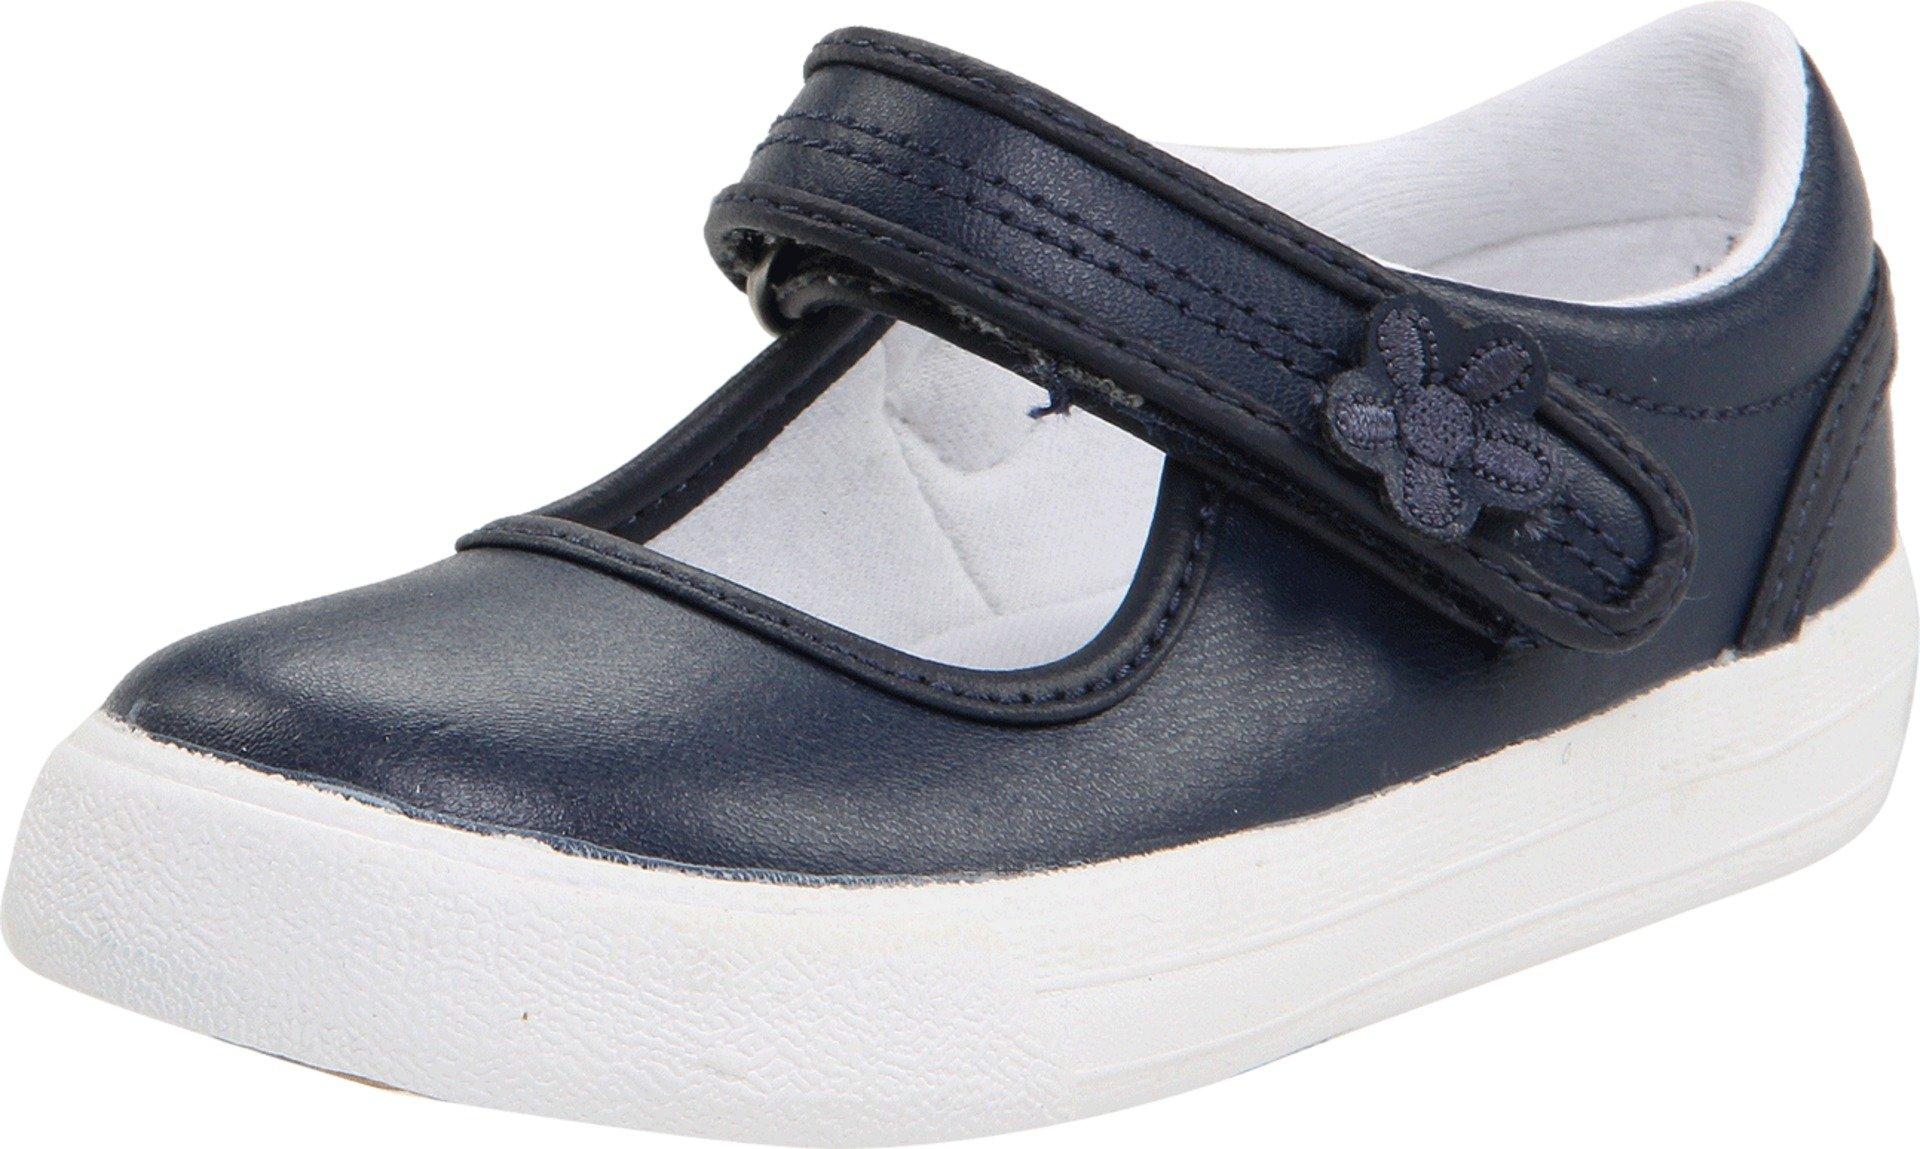 Keds unisex-child Ella Mary Jane Sneaker ,Navy,11 M US Little Kid by Keds (Image #1)